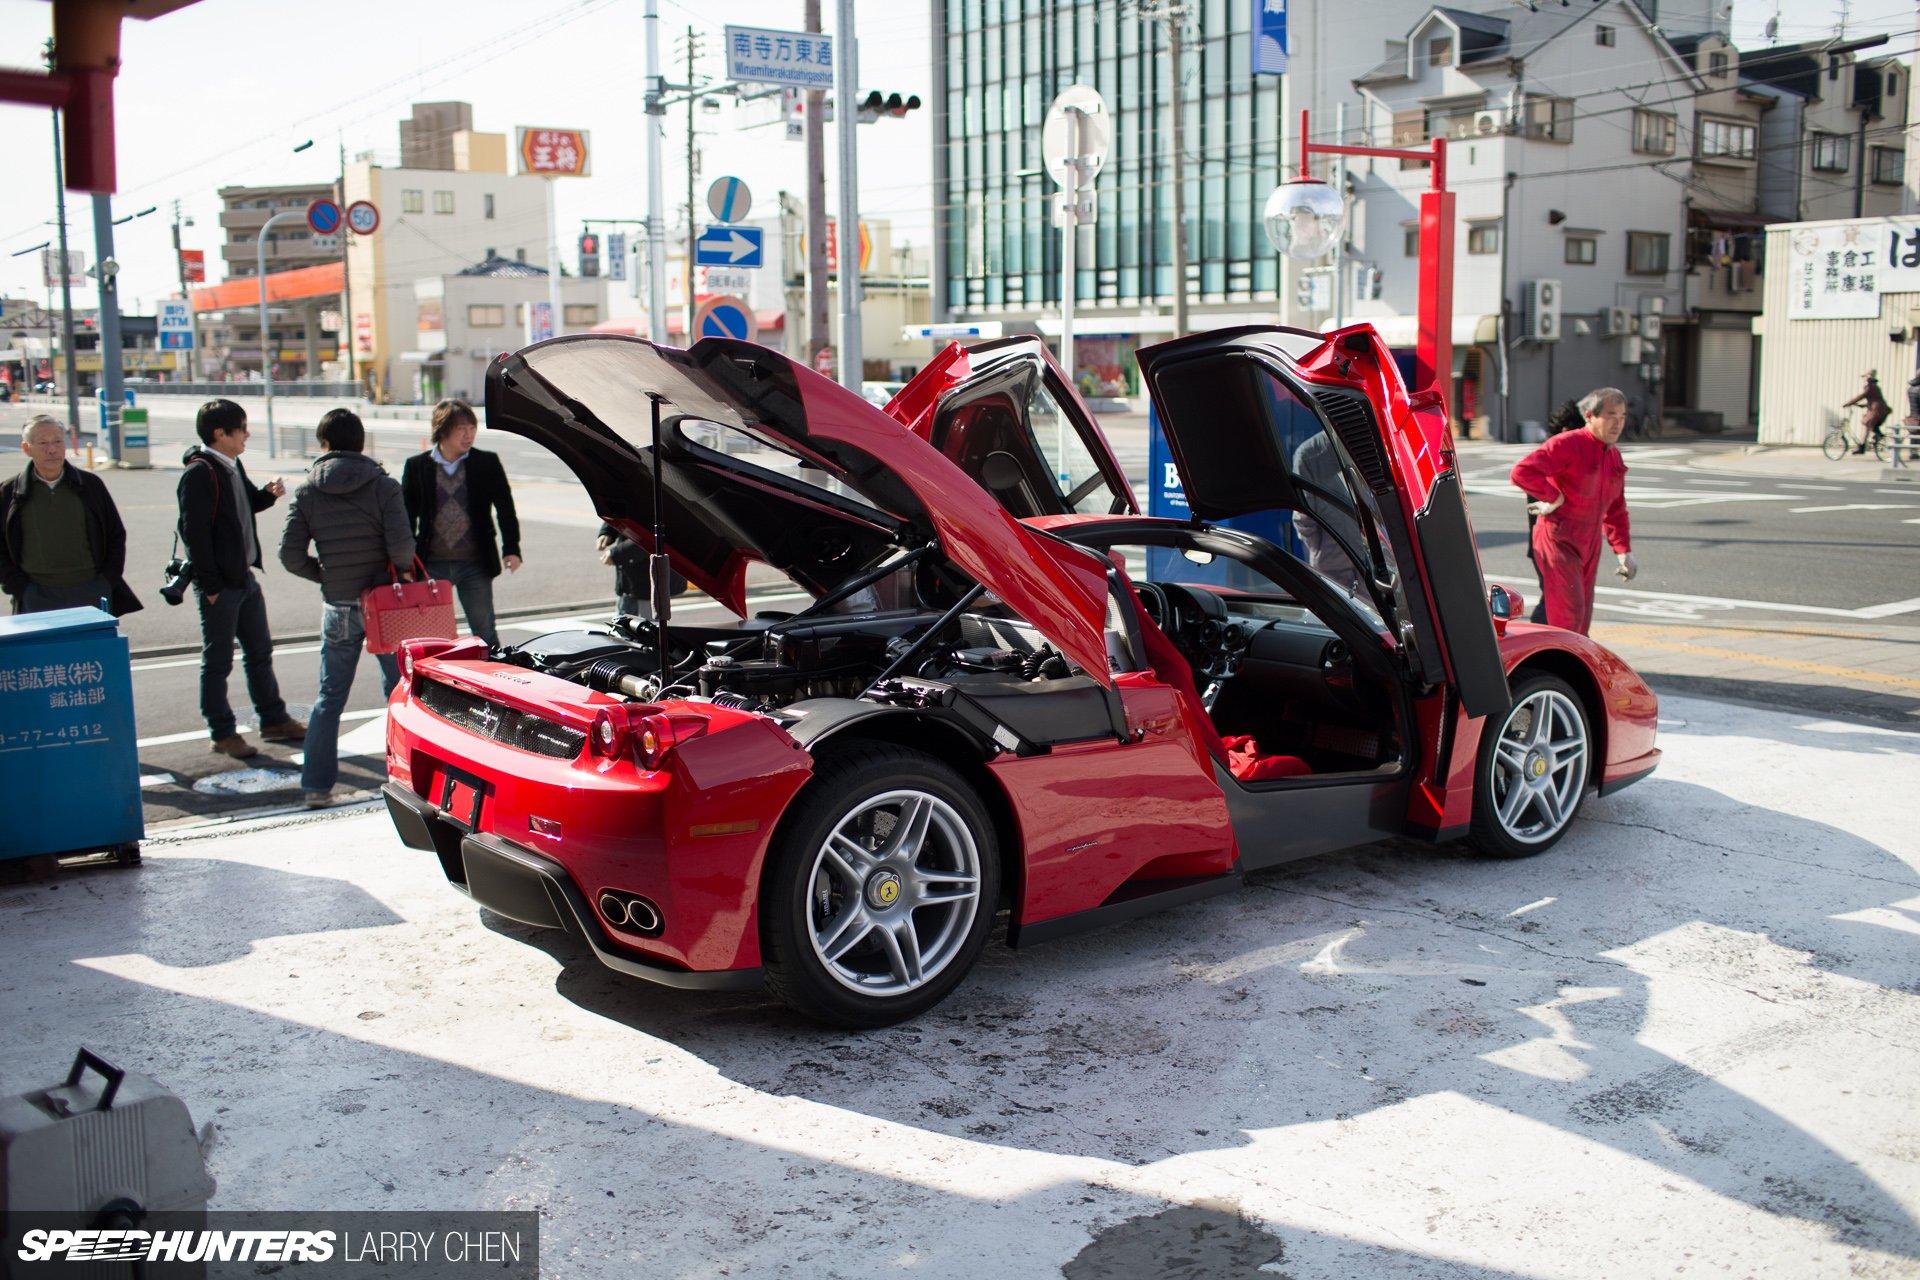 Ferrari enzo supercar interior engine g wallpaper 1920x1280 ferrari enzo supercar interior engine g wallpaper 1920x1280 268986 wallpaperup vanachro Images